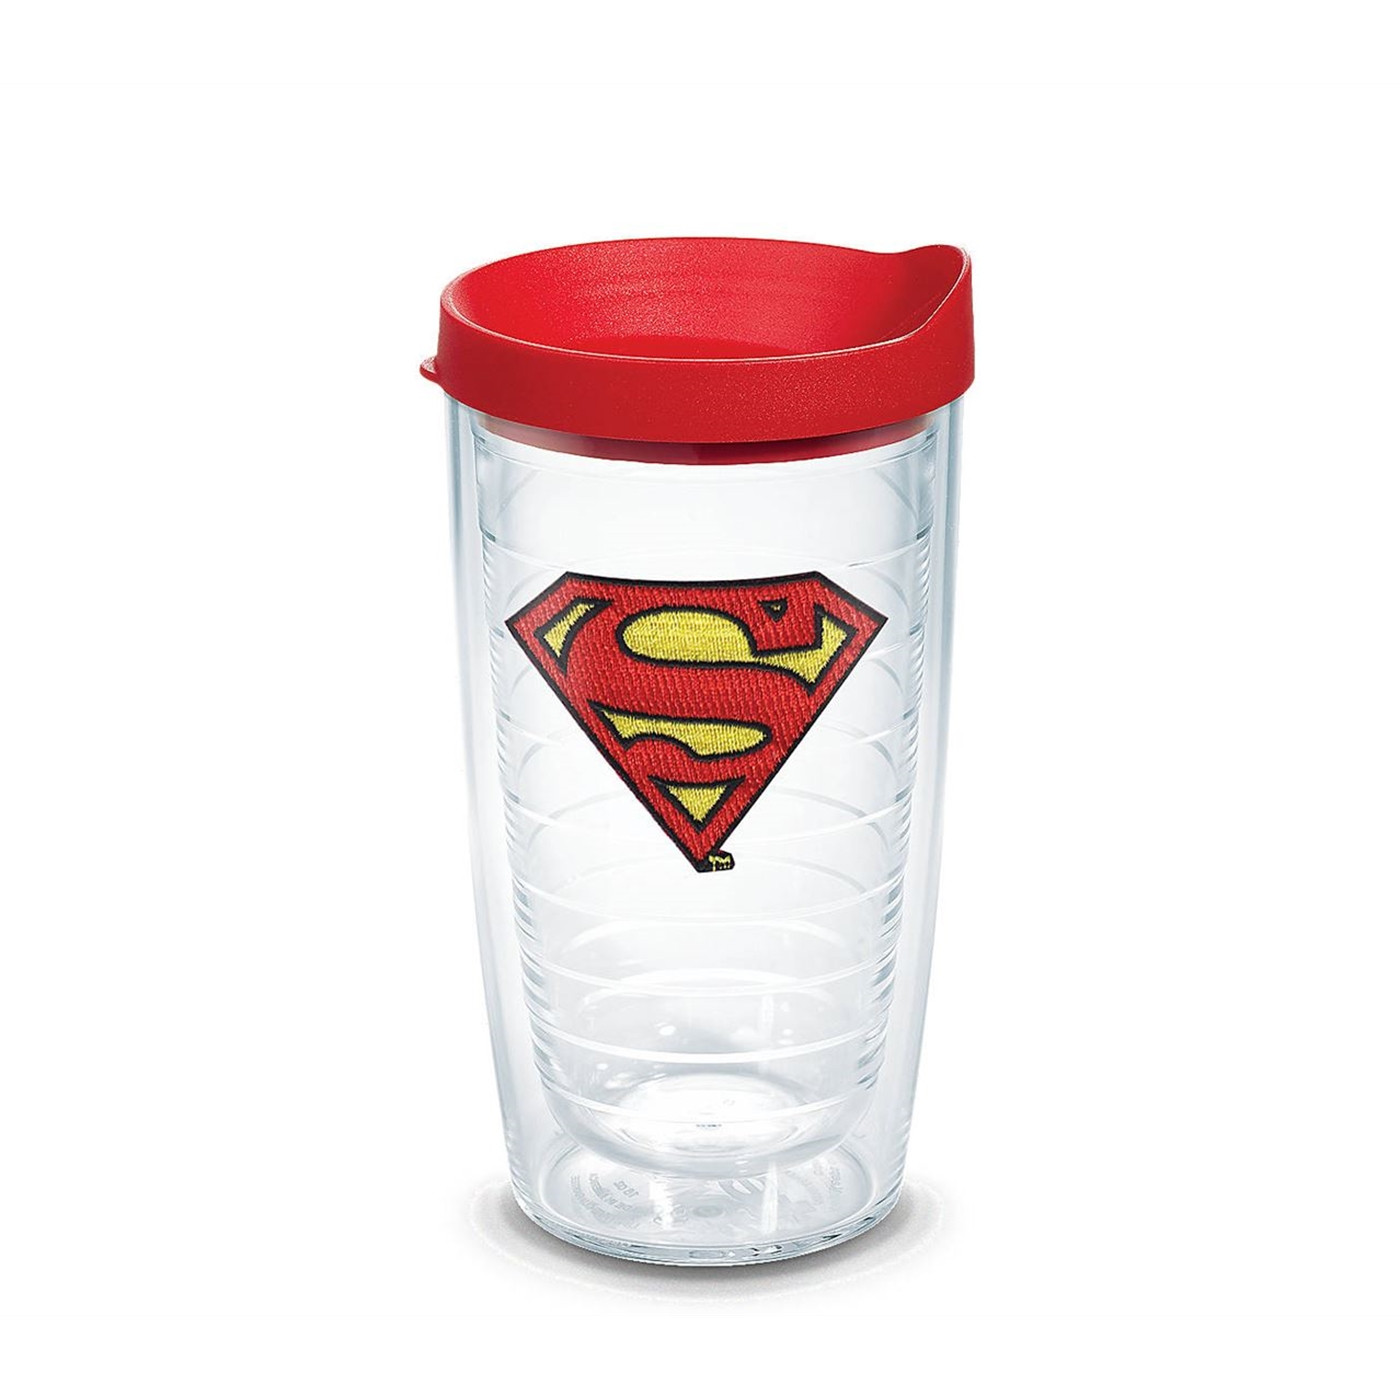 Superman Emblem Tumbler with Lid 16 oz Tervis